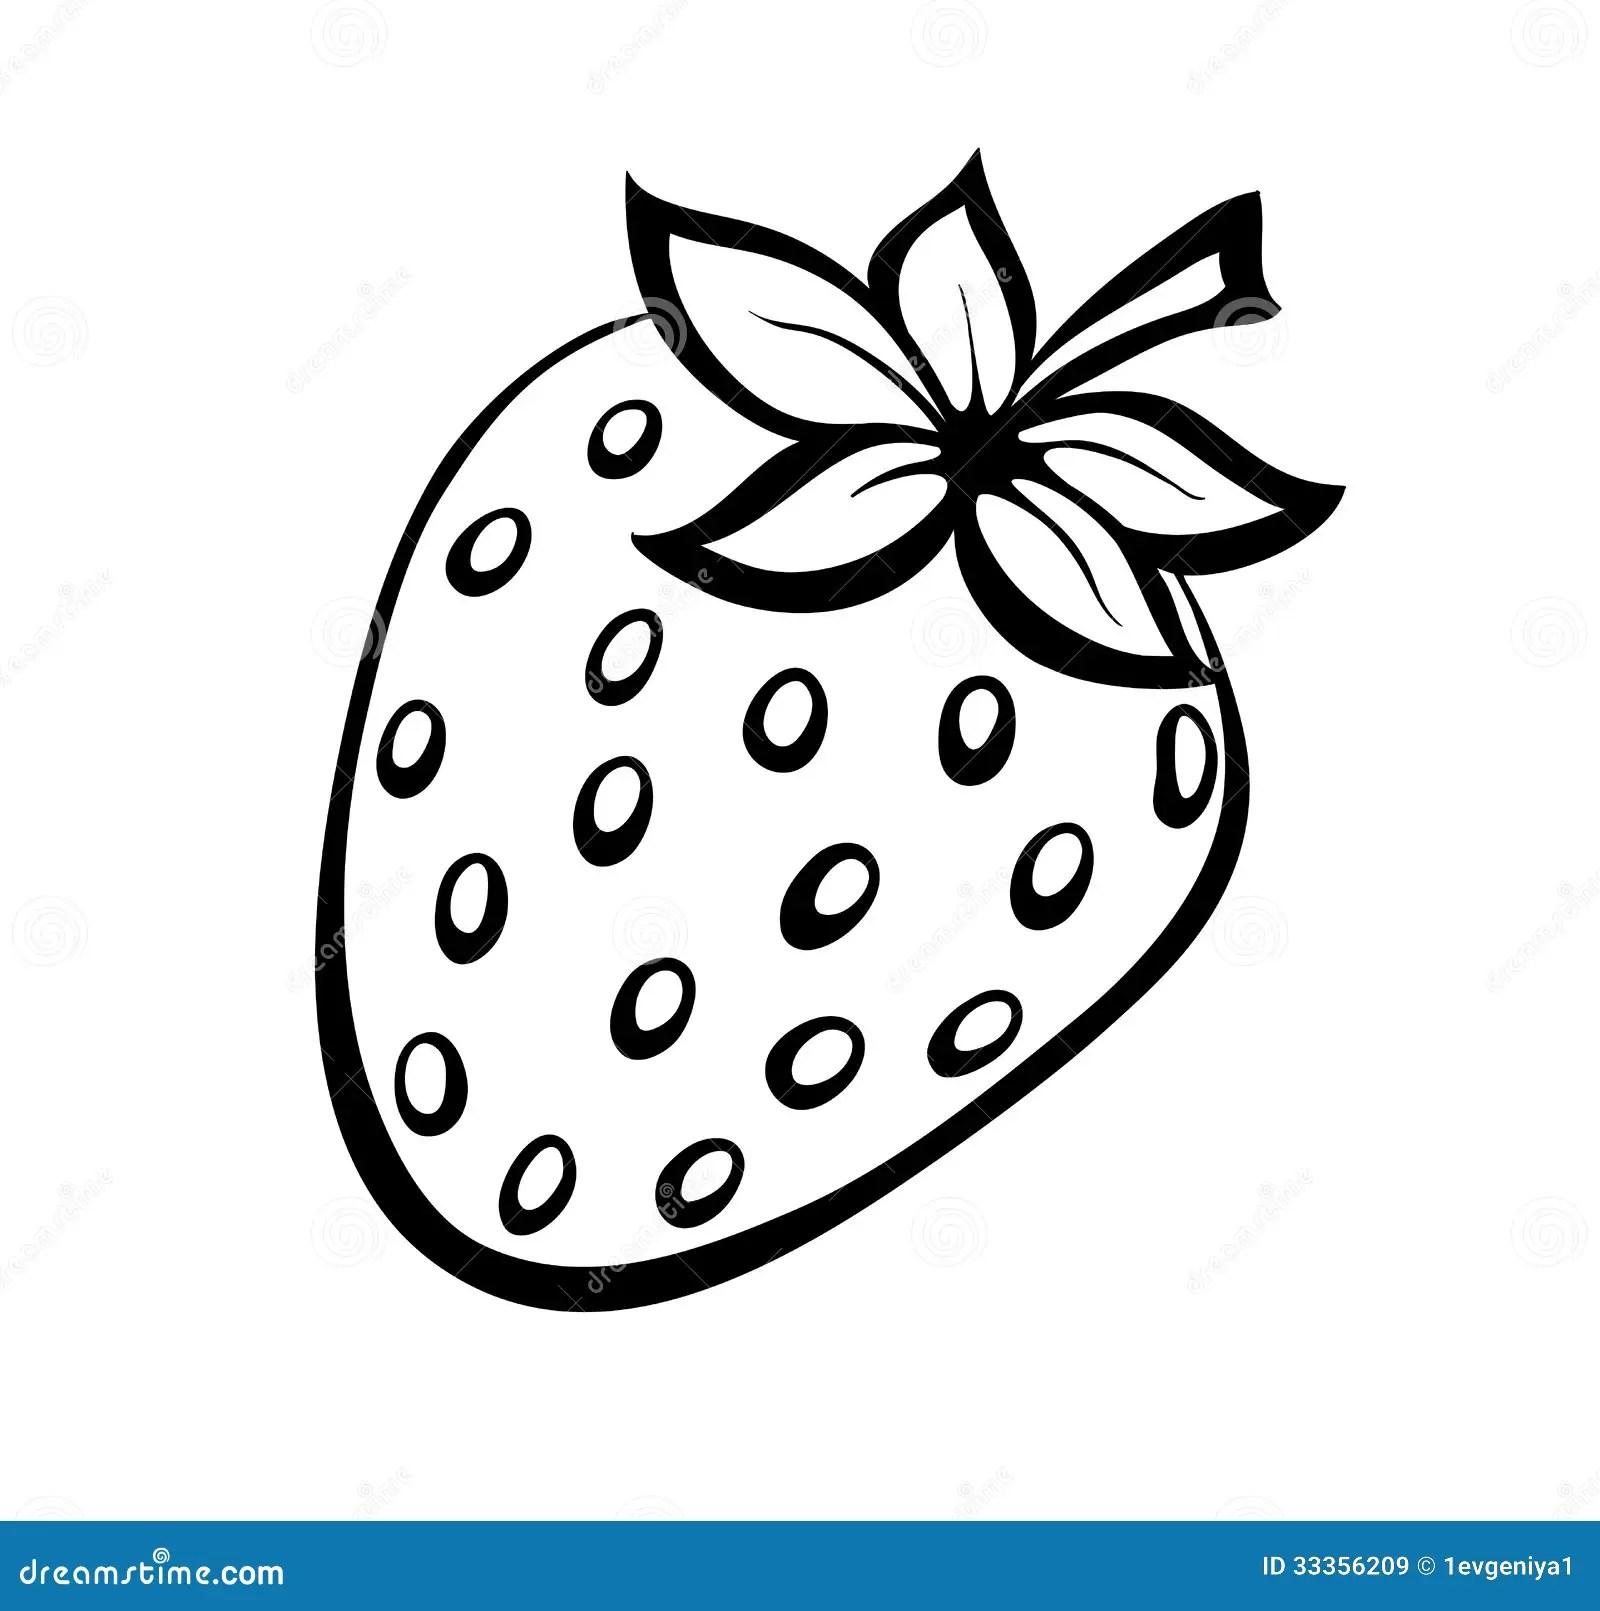 Vector Monochrome Illustration Of Strawberries Logo Stock